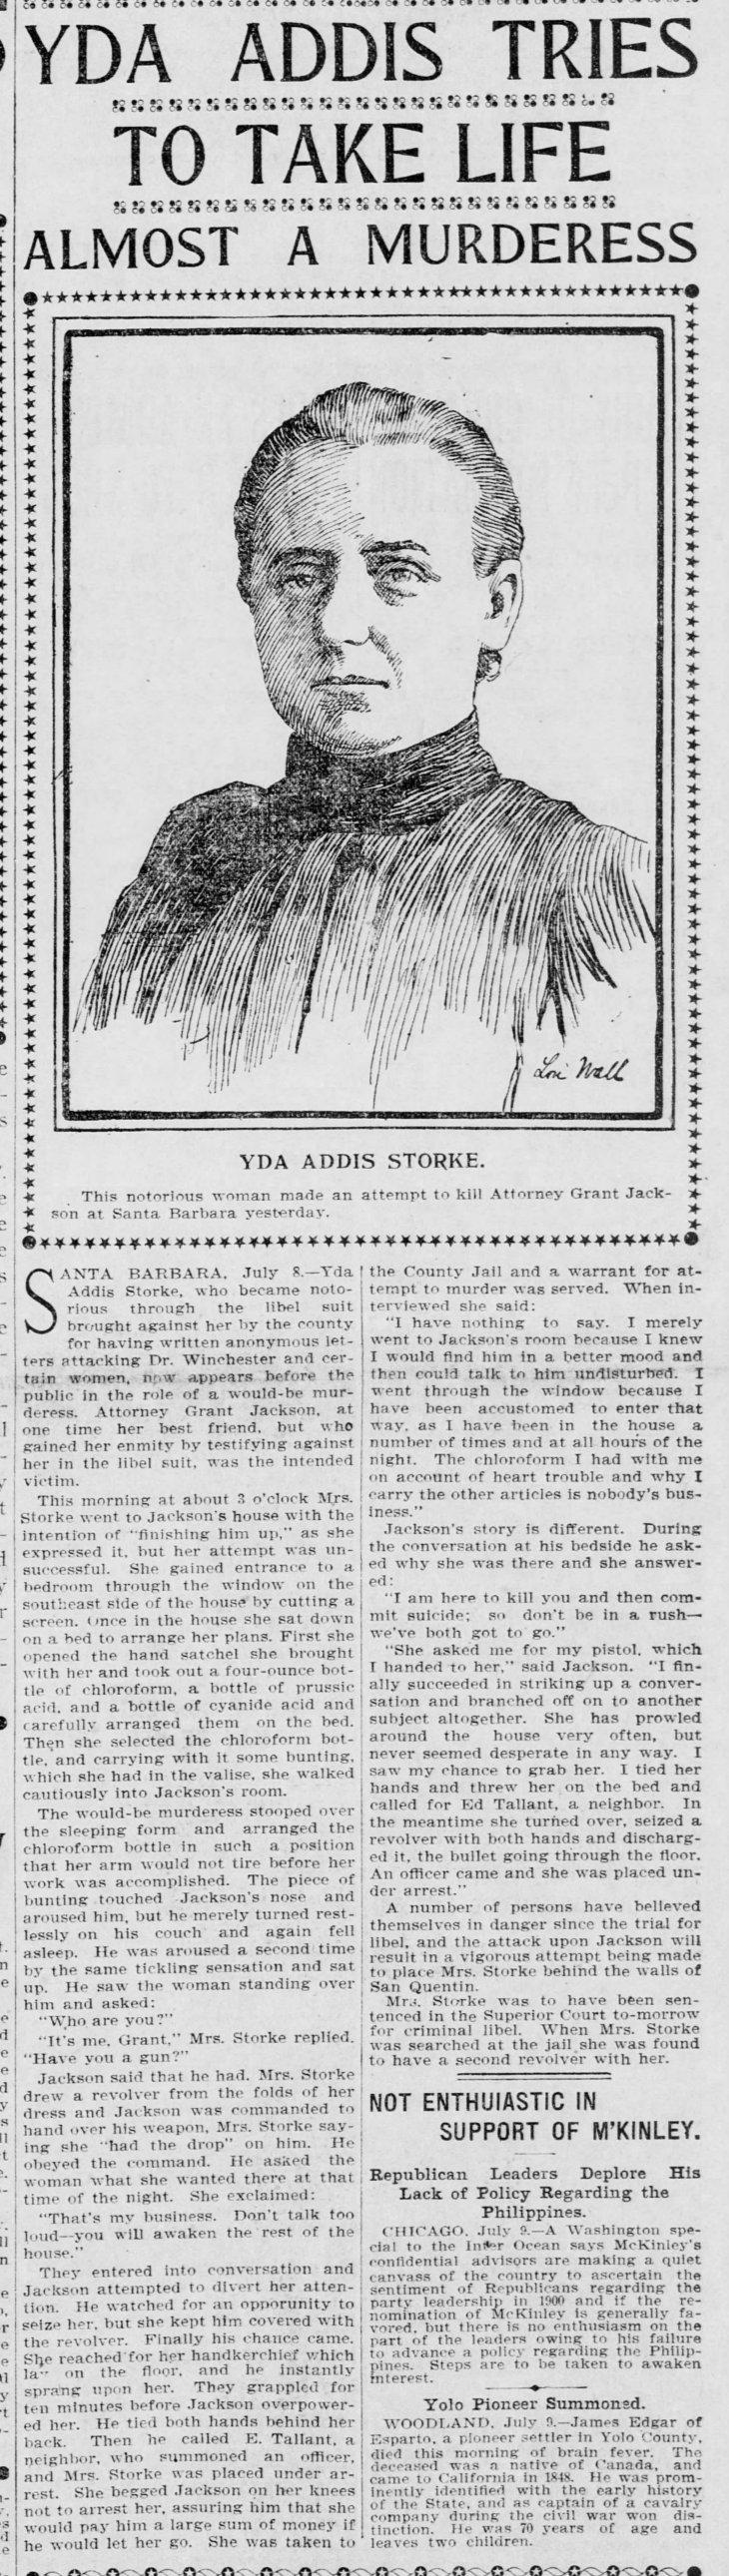 Yda suicide murder attempts The_San_Francisco_Call_Mon__Jul_10__1899_